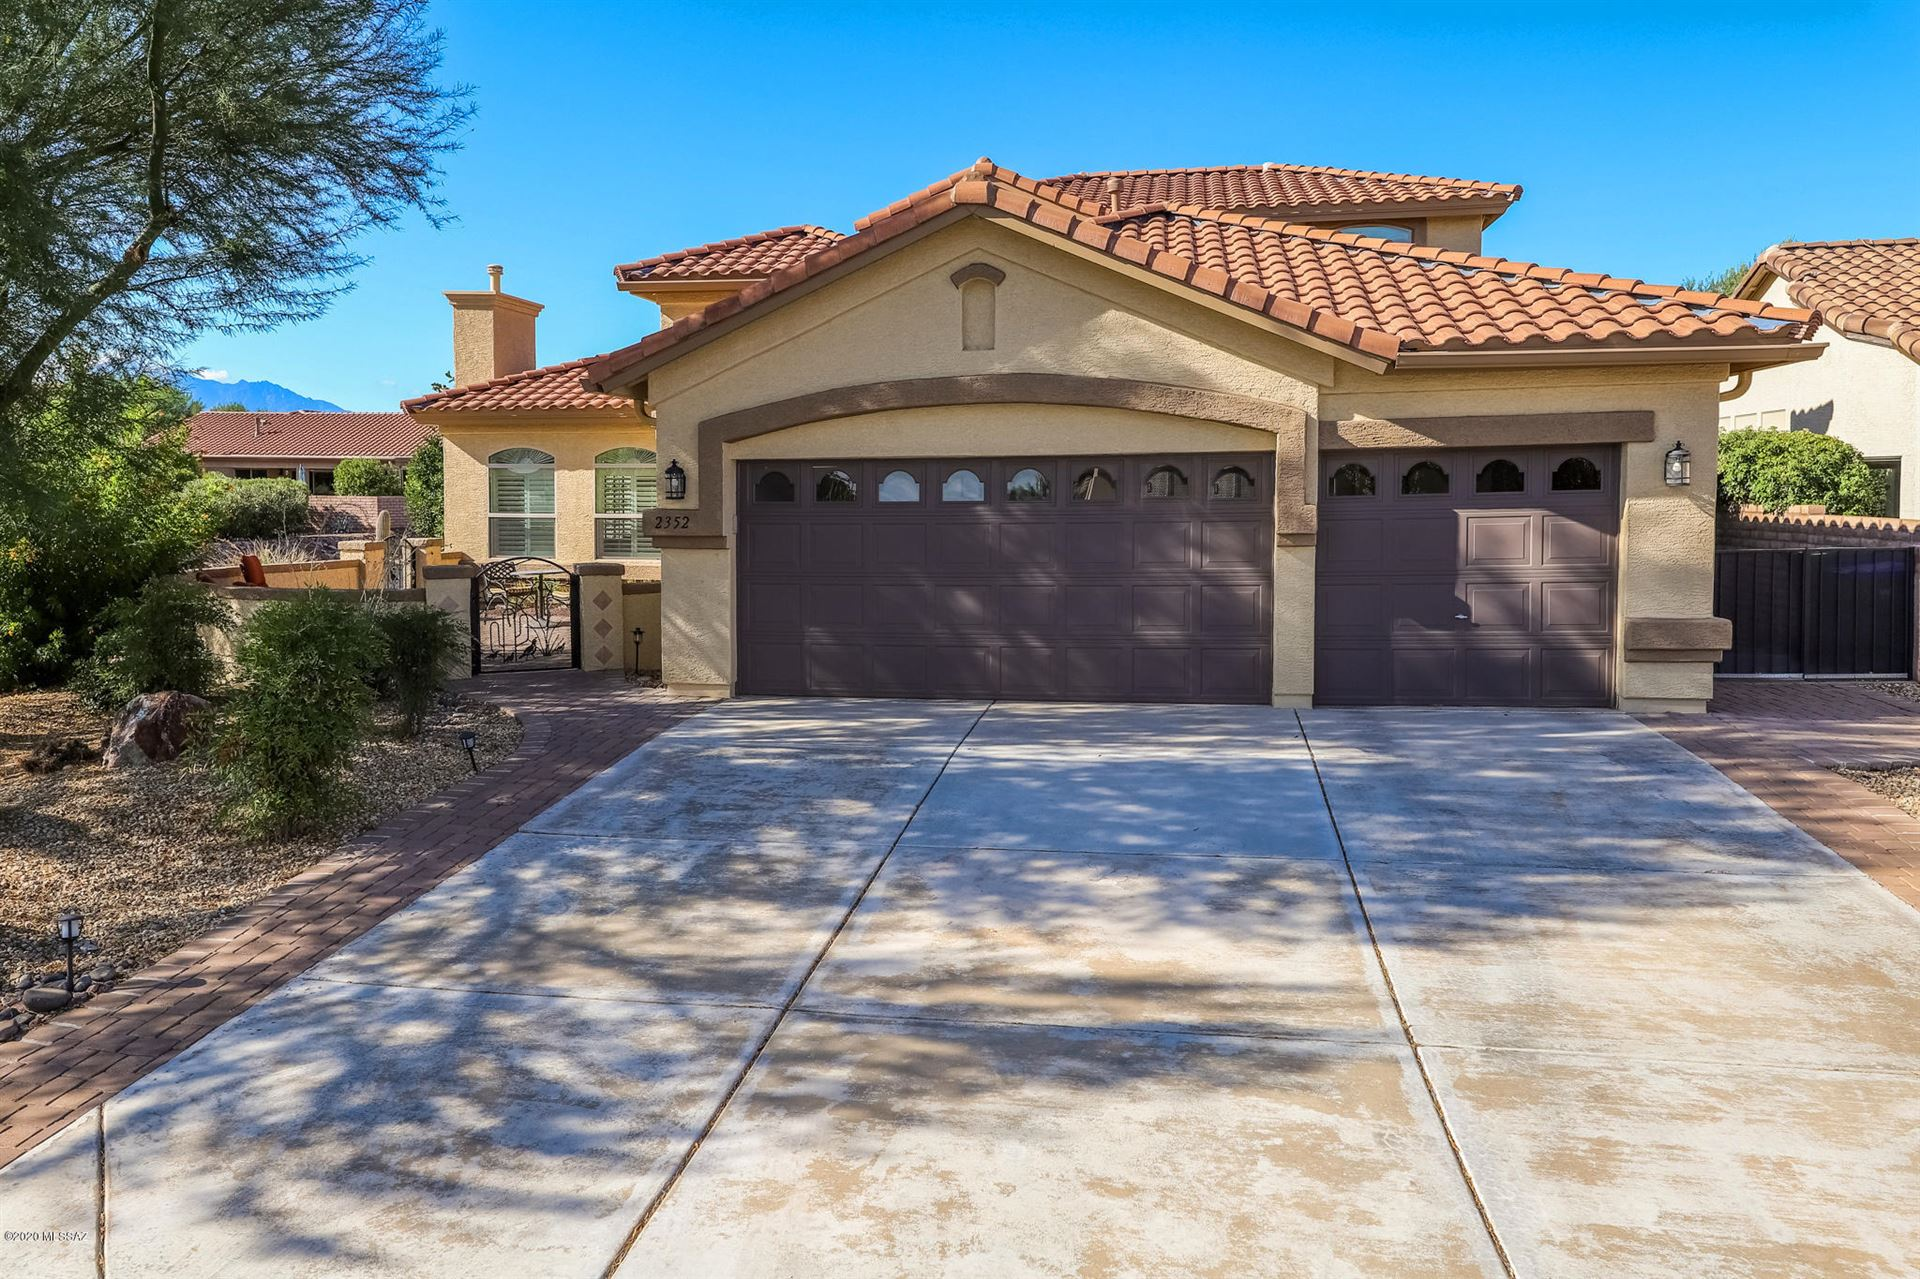 2352 E Mayview Drive, Green Valley, AZ 85614 - #: 22021745